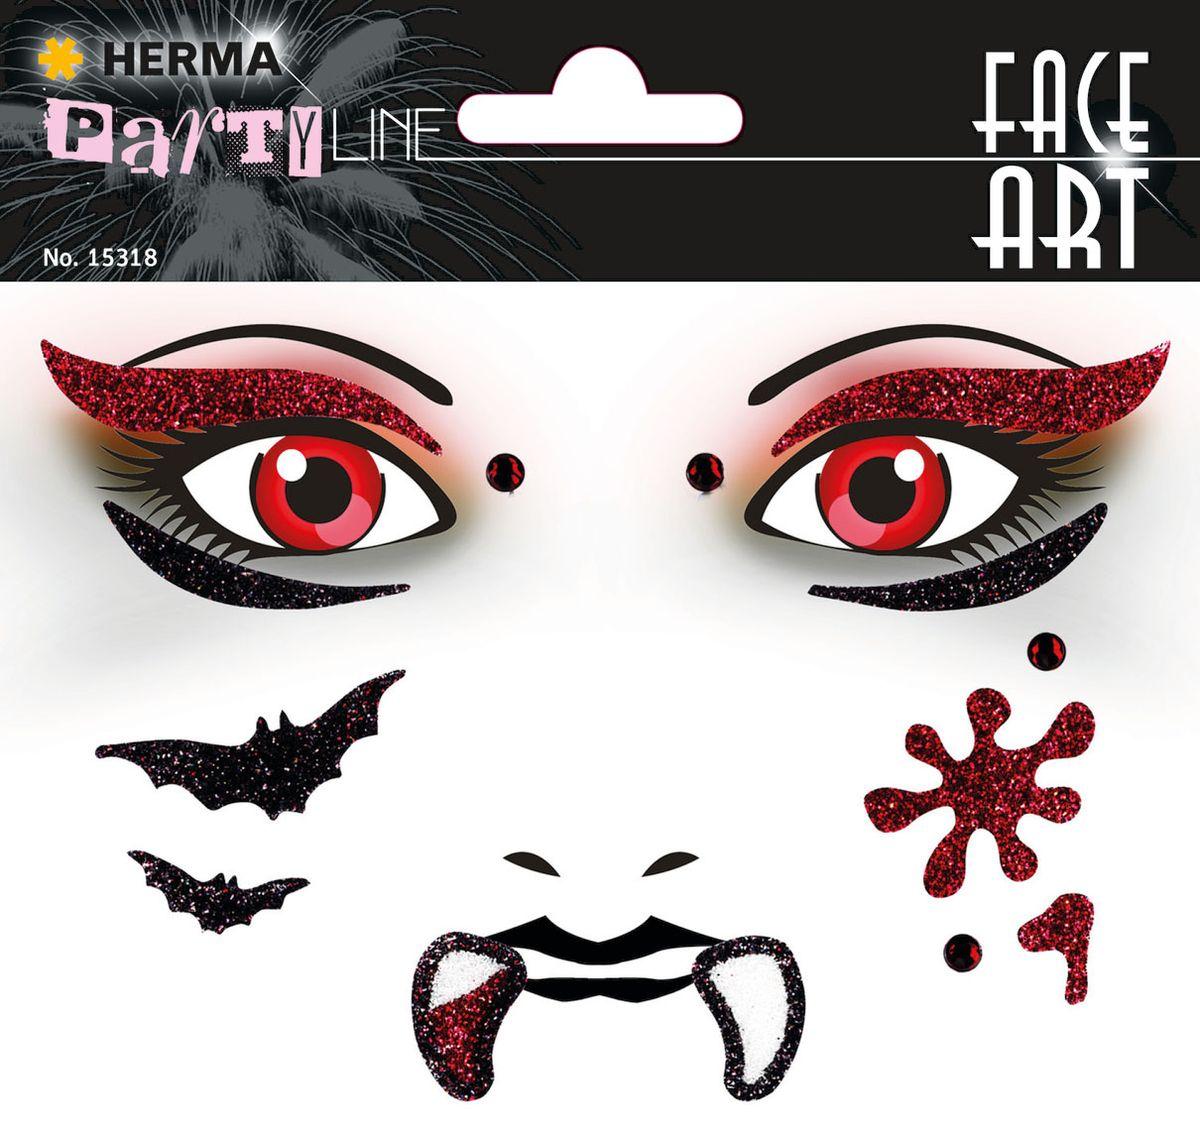 Herma Наклейки на лицо Face Art Vampire (Вампир)